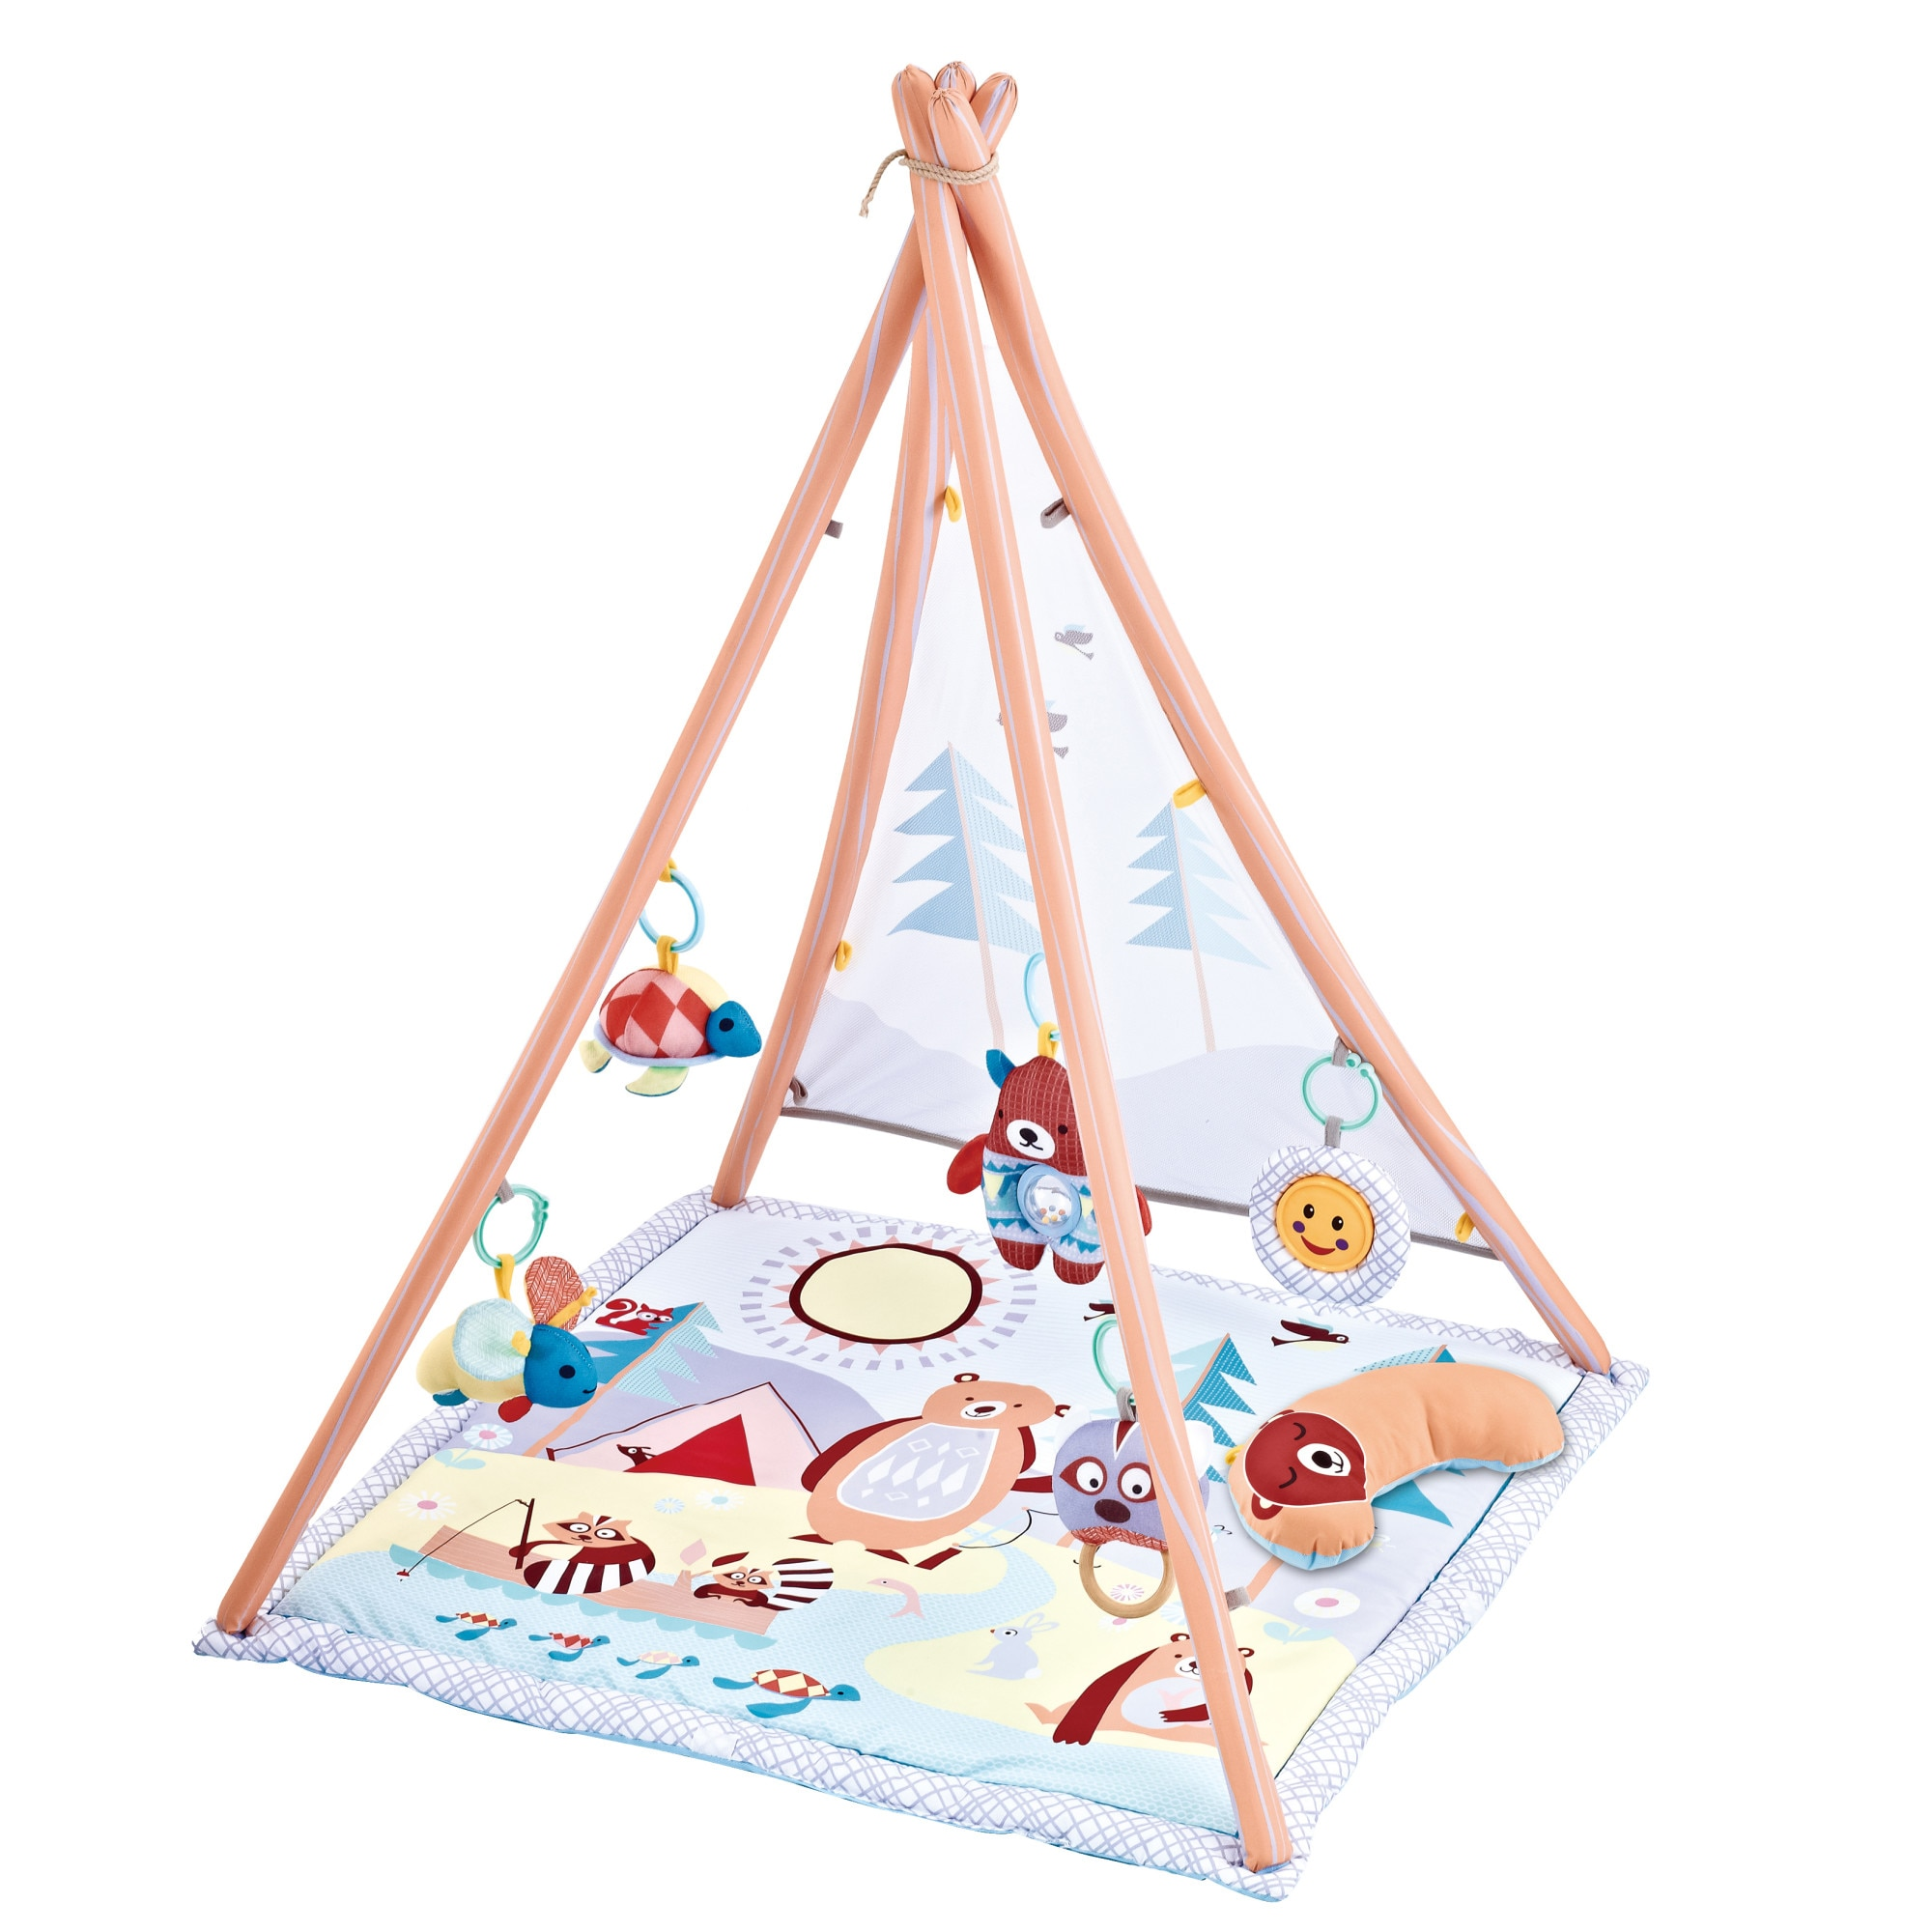 Fotografie Saltea de joaca M-Toys - cort cu 20 mingi si 6 jucarii, roz